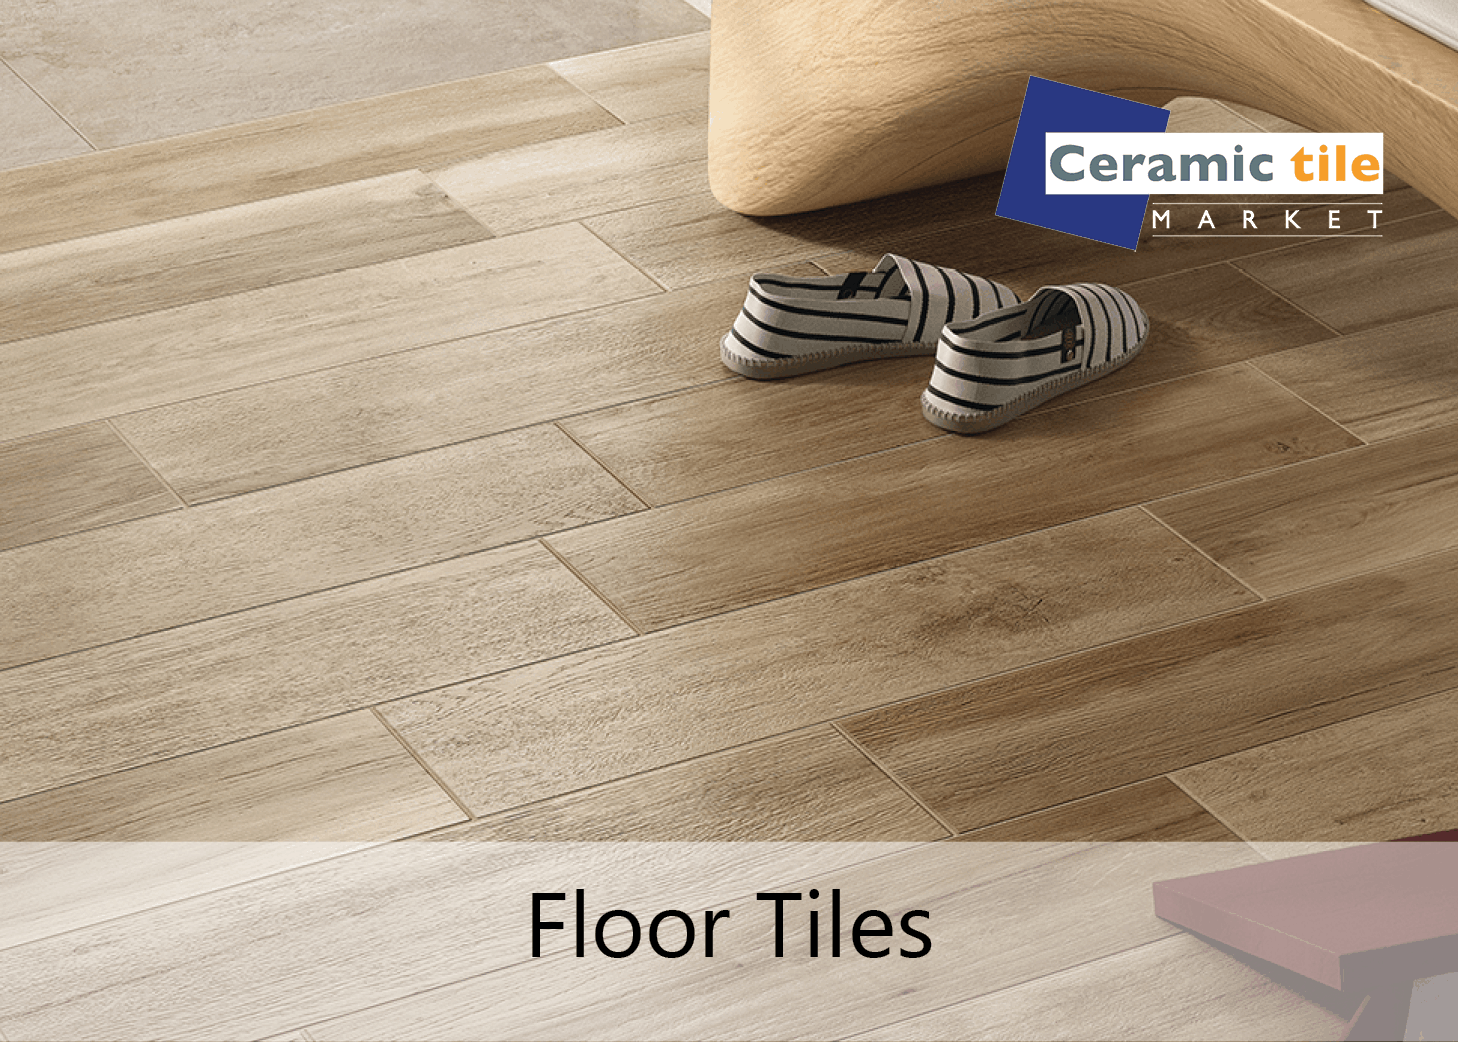 ceramic tile market emc tiles floor tiles urbiko wood effect